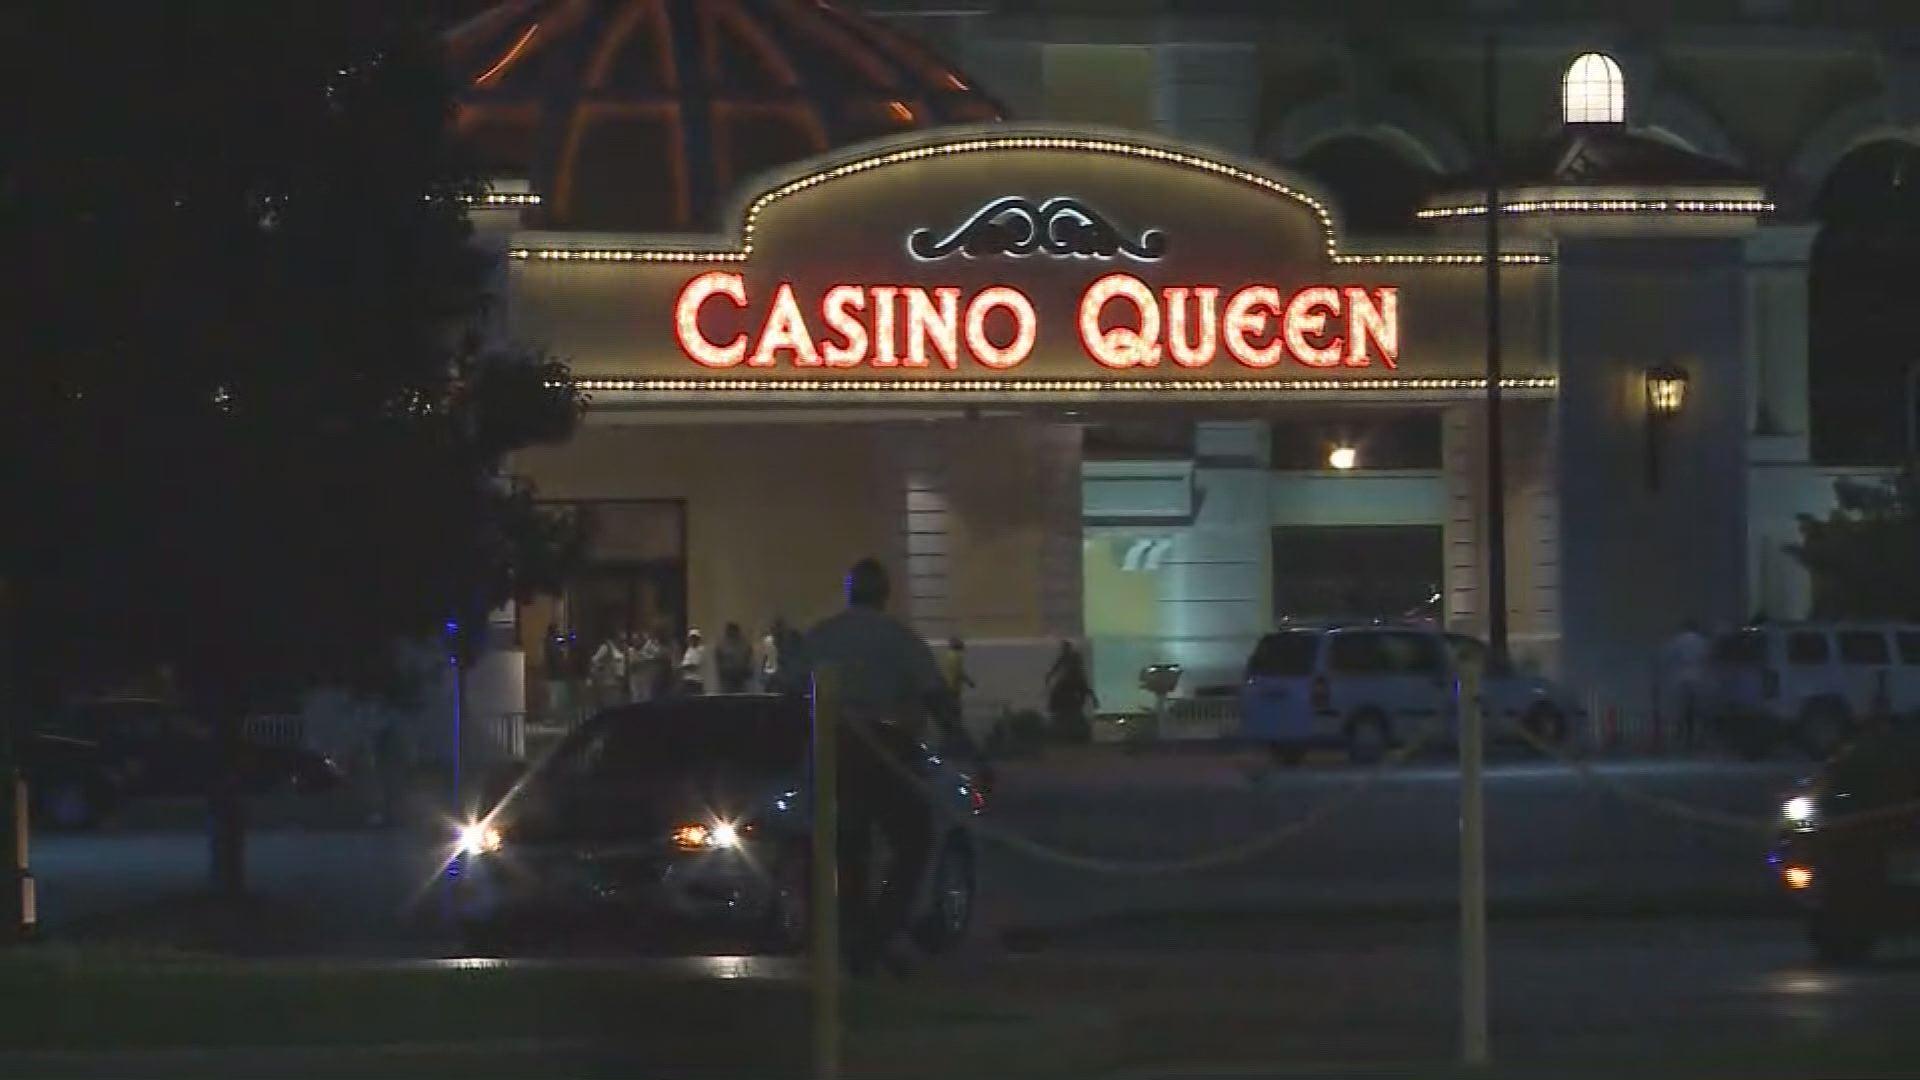 Hot wife casino queen st louis casino native reserve